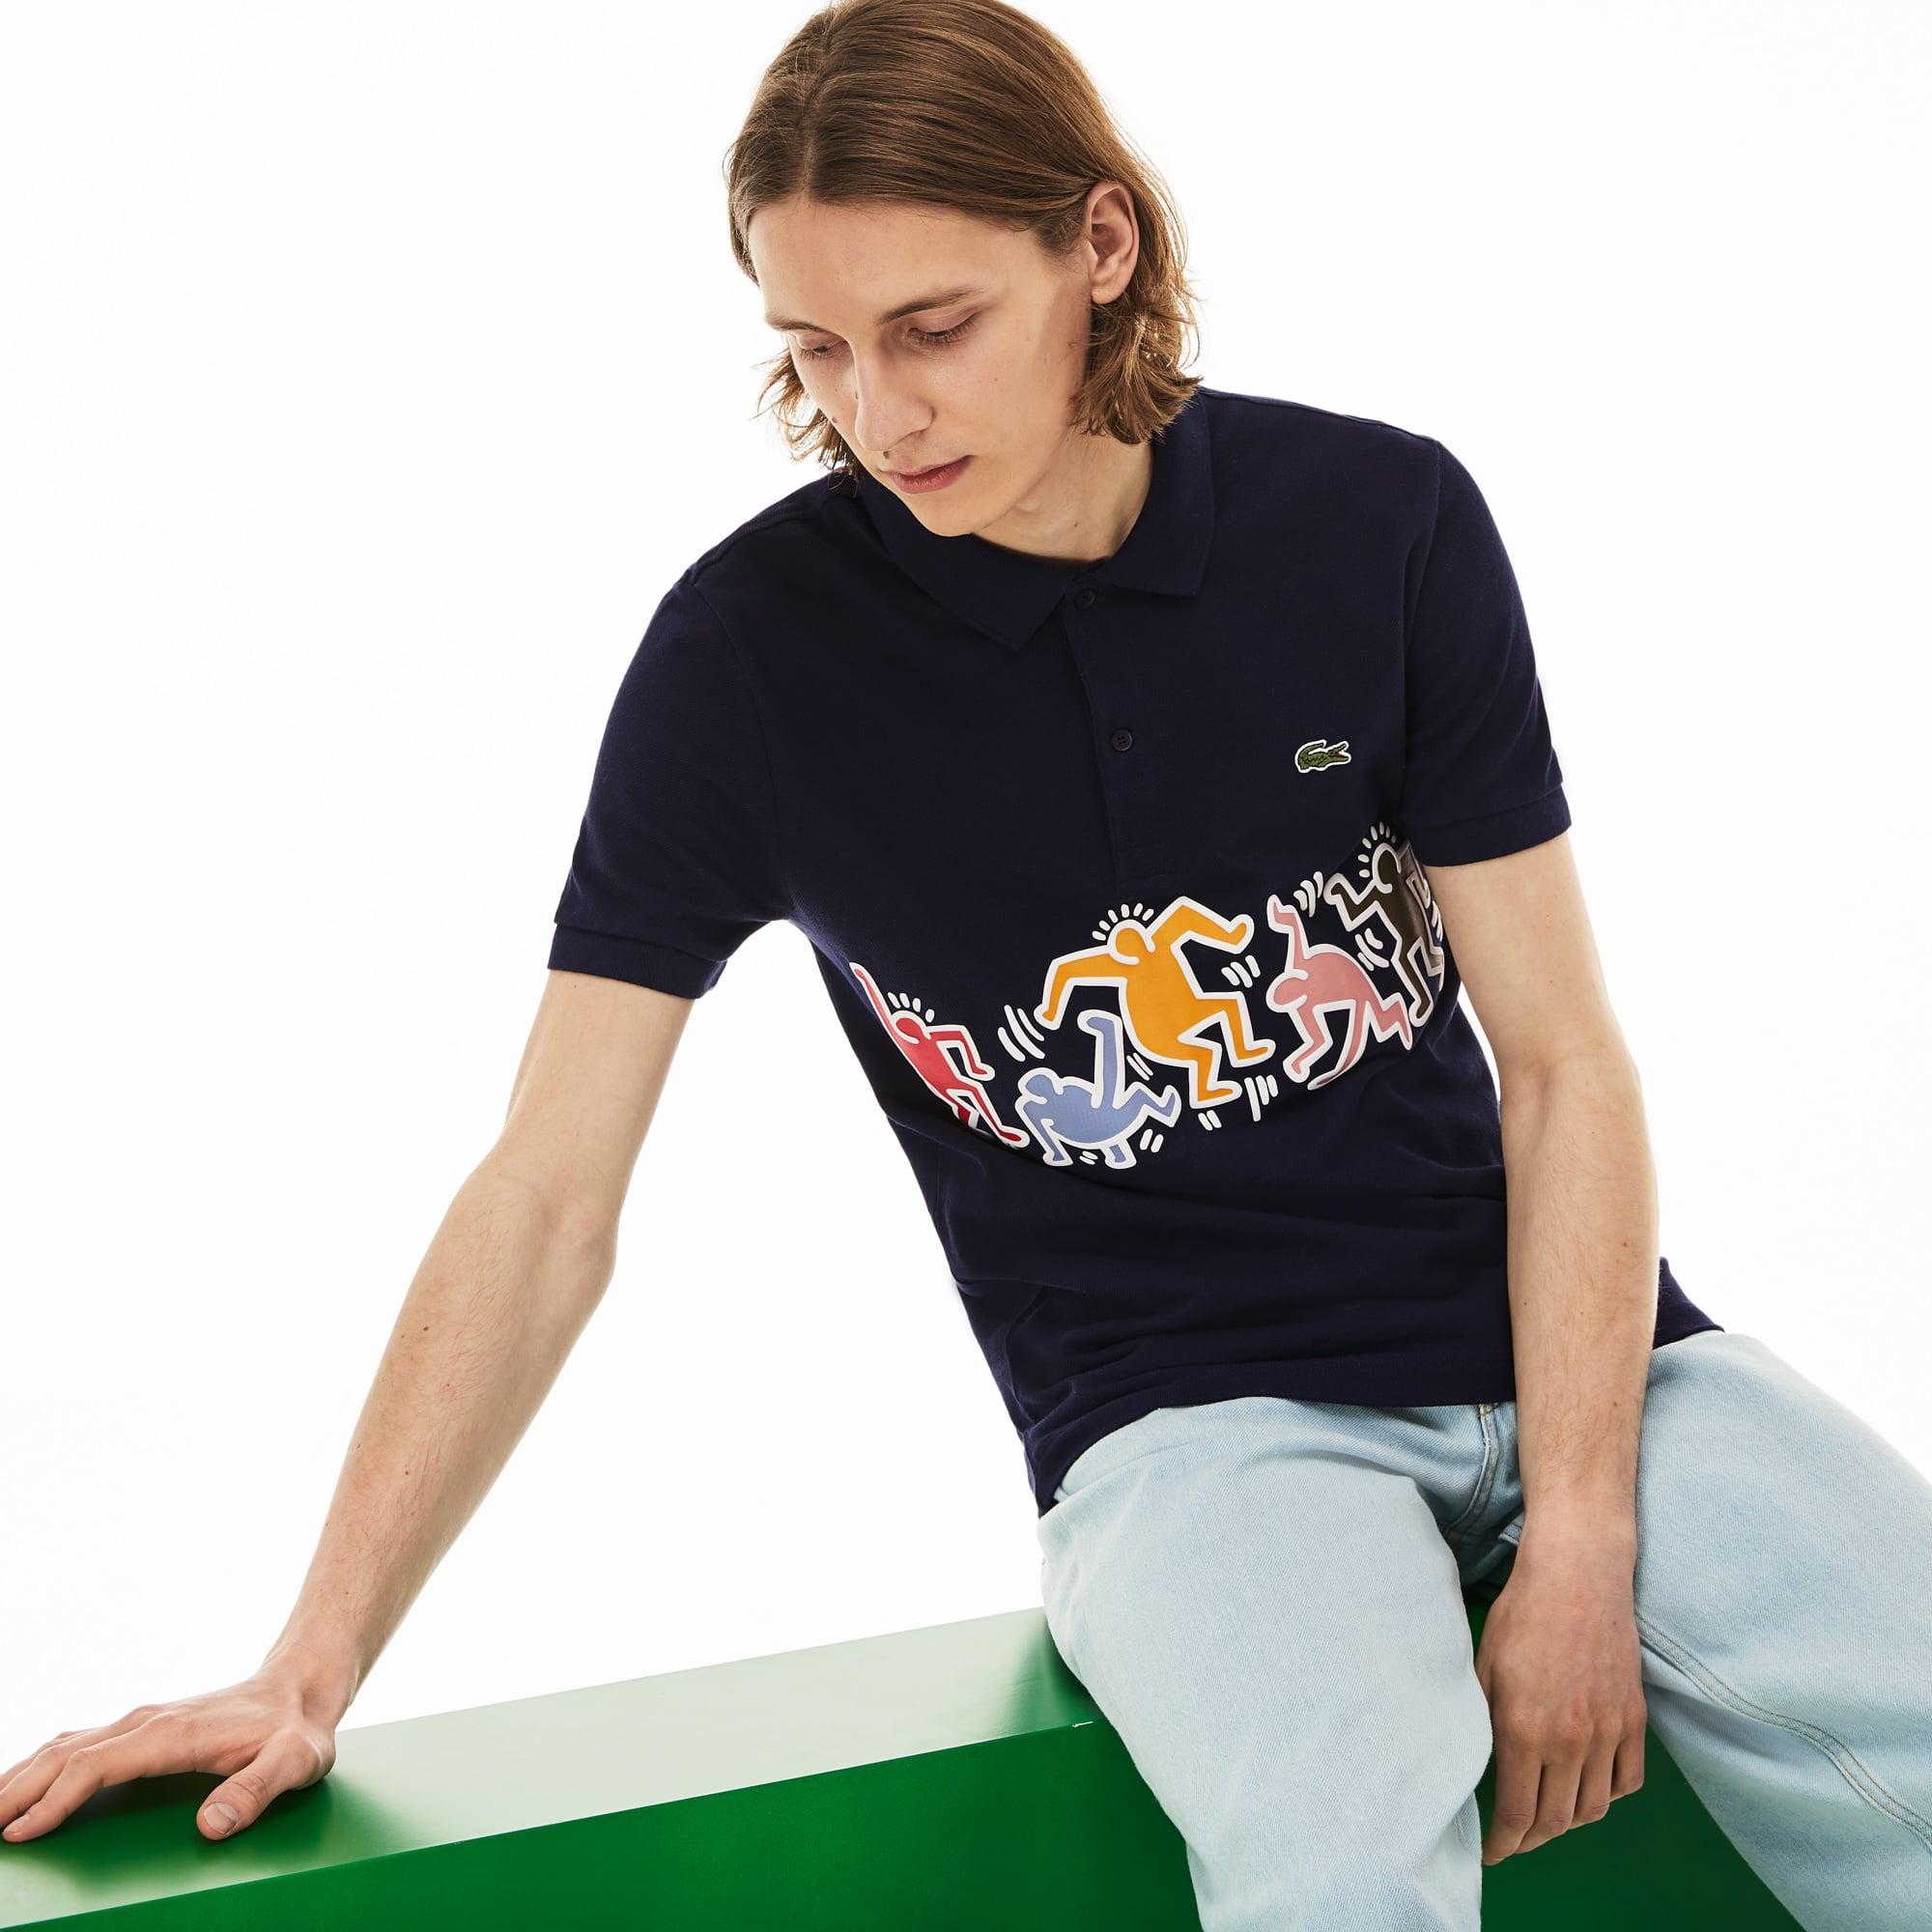 0198138cf84 + 2 colours. 30% off. Men's Lacoste Keith Haring Print Band Regular Fit  Petit Piqué ...